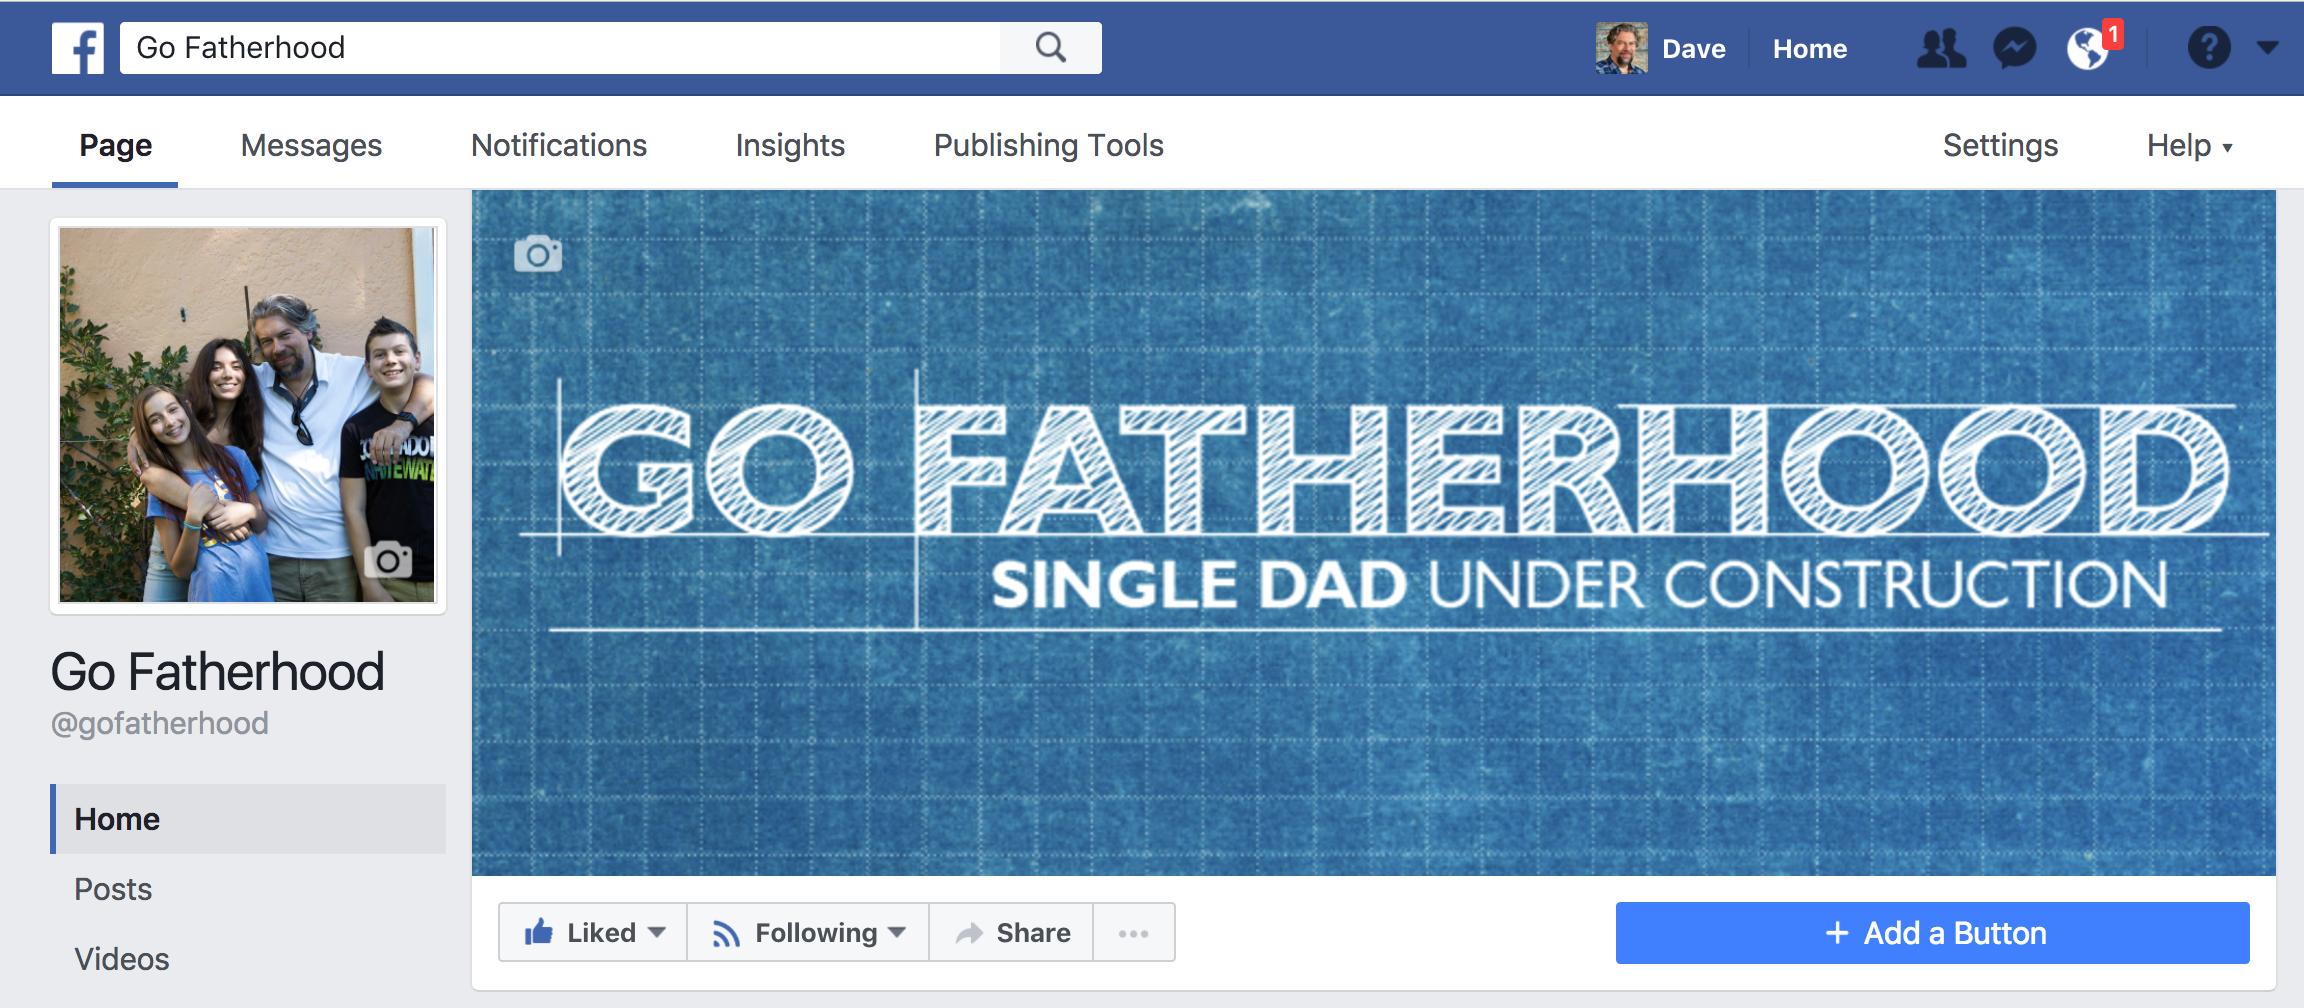 facebook business page gofatherhood top banner